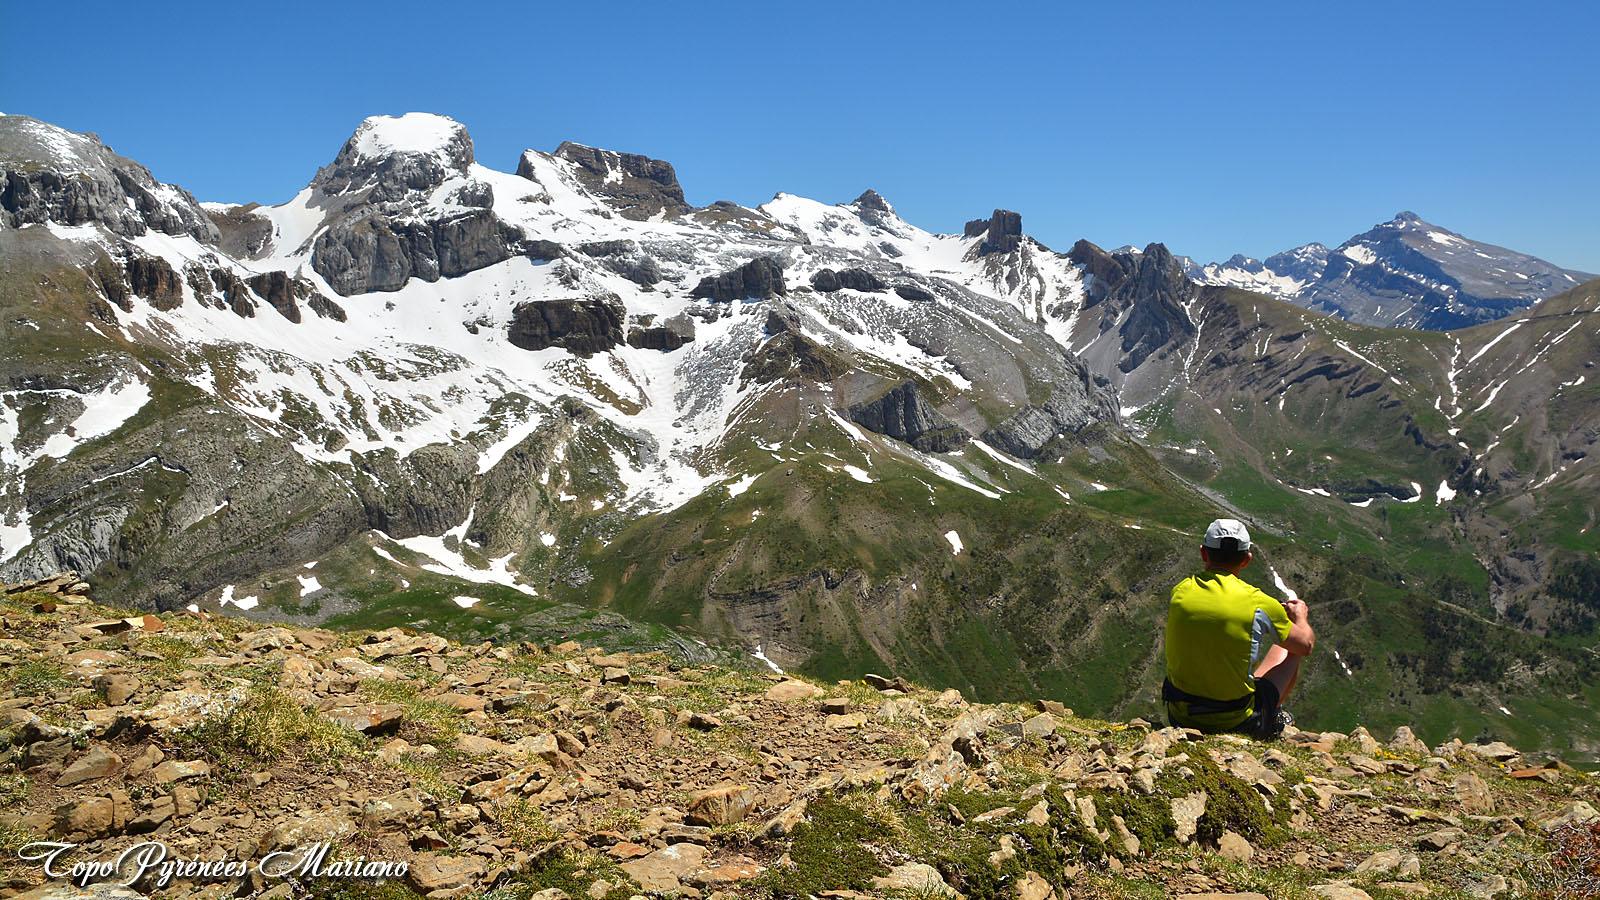 Randonnée Pico Mesola (2168m) en boucle